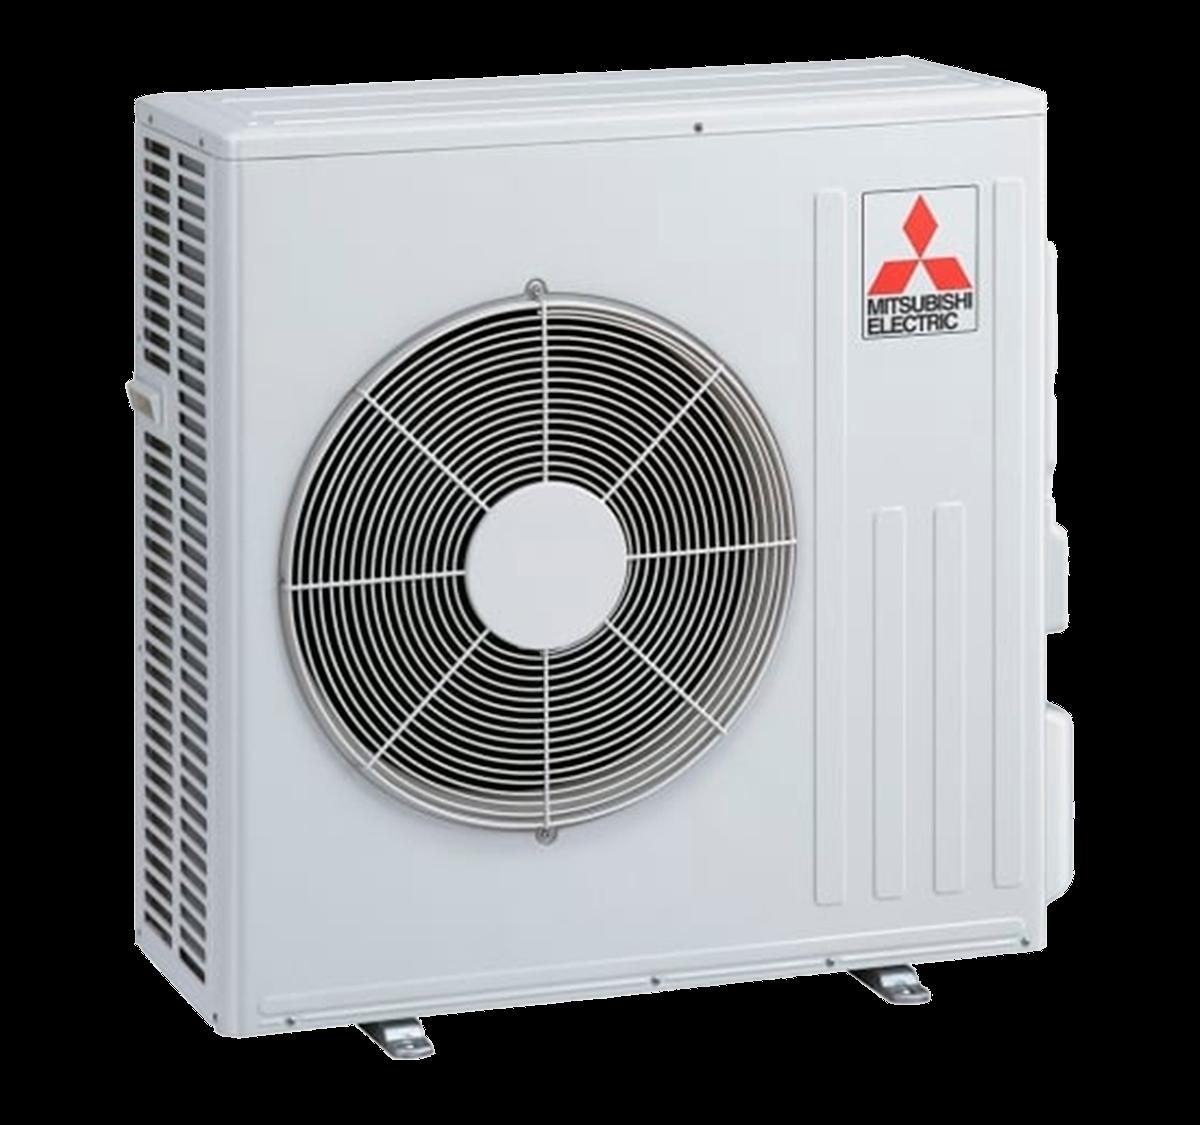 aire acondicionado unidad exterior mitsubishi electric inverter muz ln60vg serie kirigamine style modelo msz ln60vgb precio incluido instalacion caseragua 01